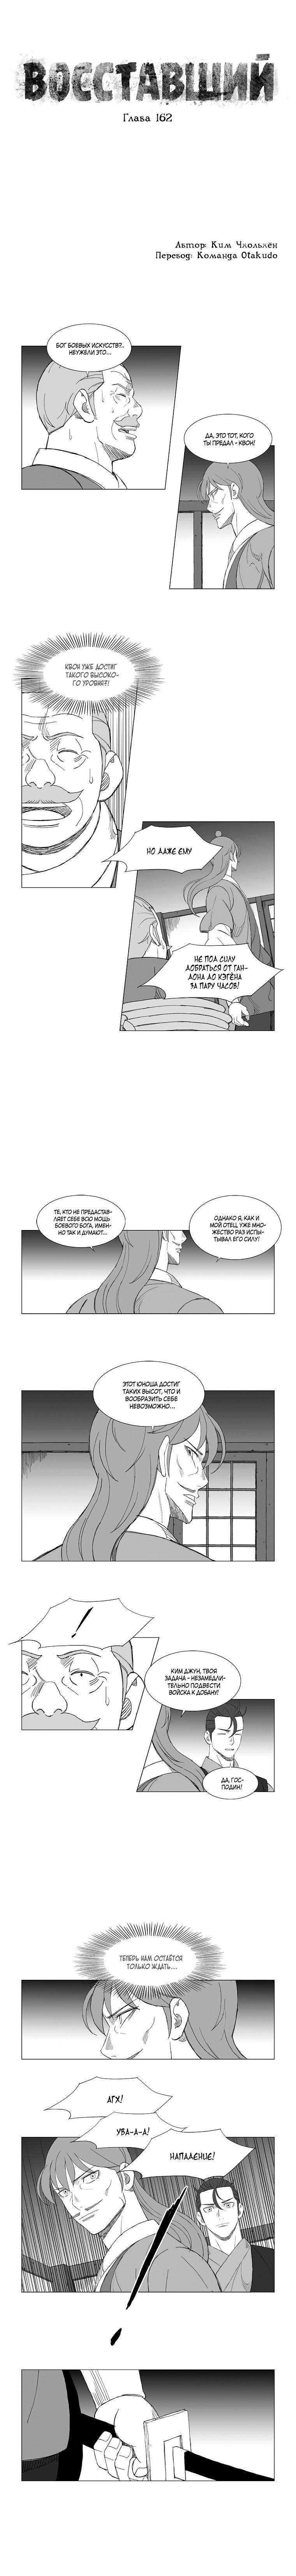 https://r1.ninemanga.com/comics/pic2/39/28263/1037268/1539989667601.jpg Page 1